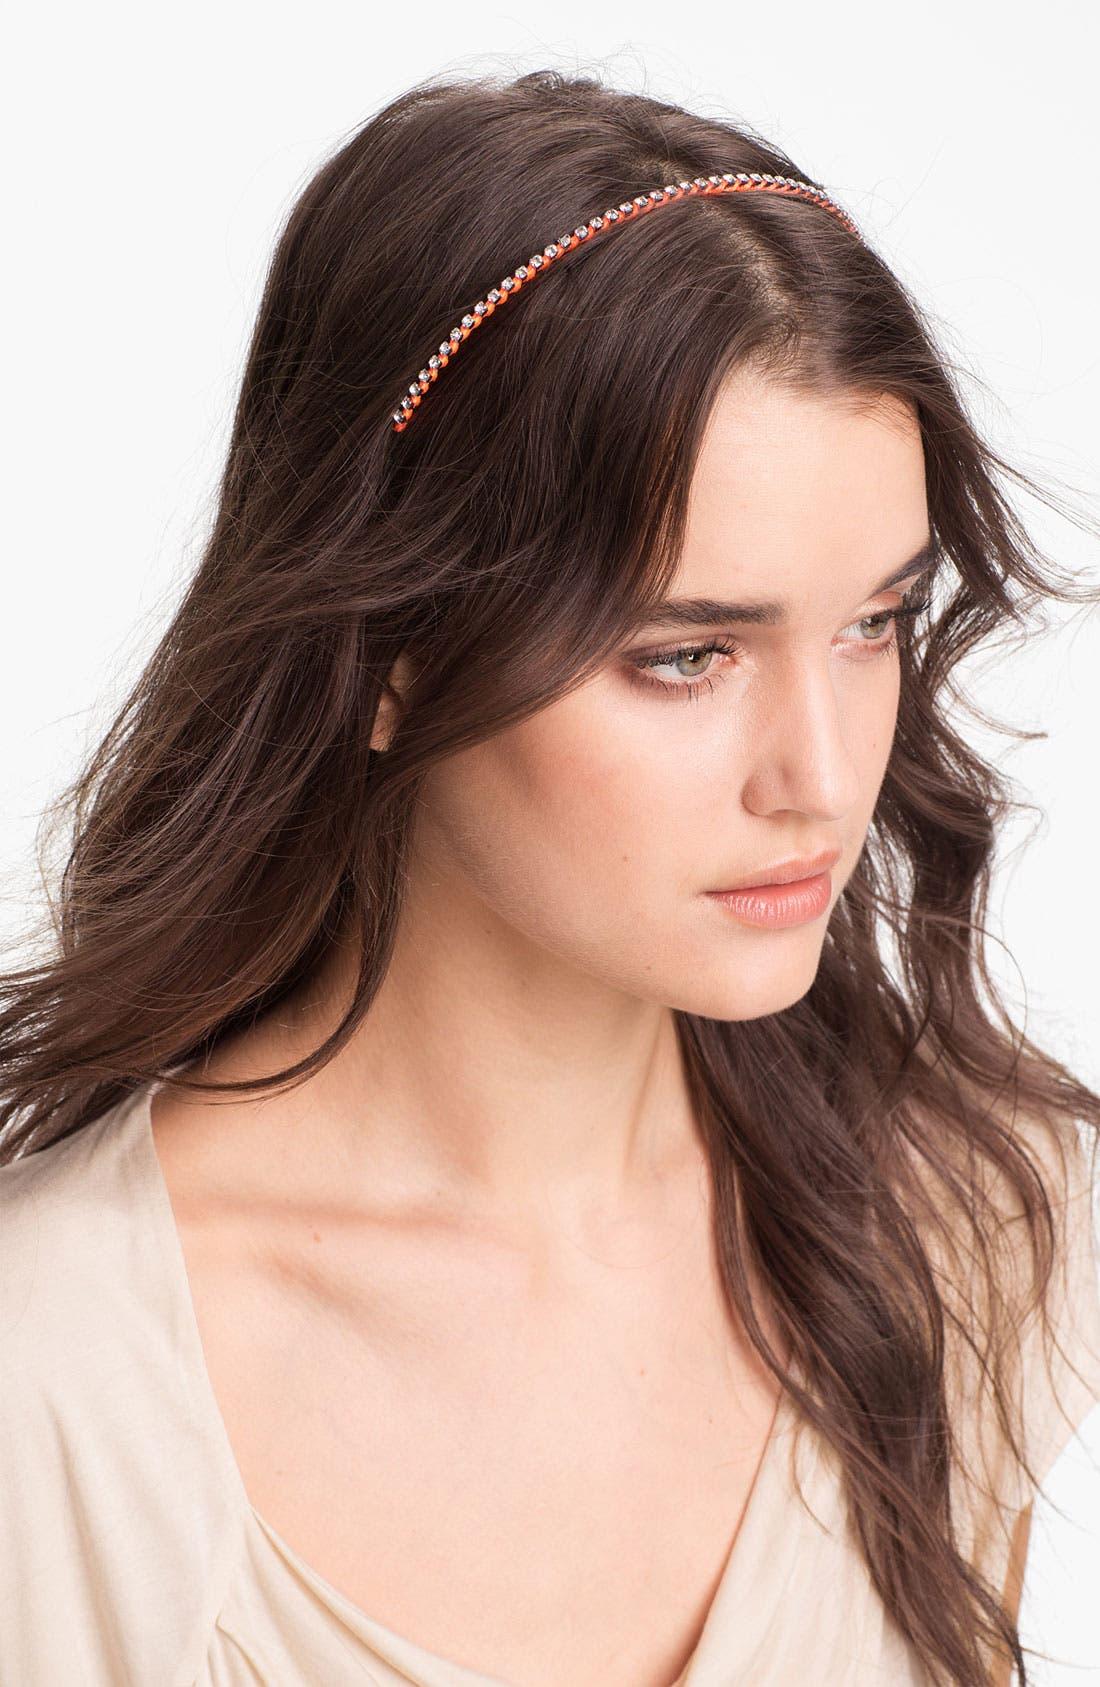 Skinny Crystal Neon Headband,                             Main thumbnail 1, color,                             Orange